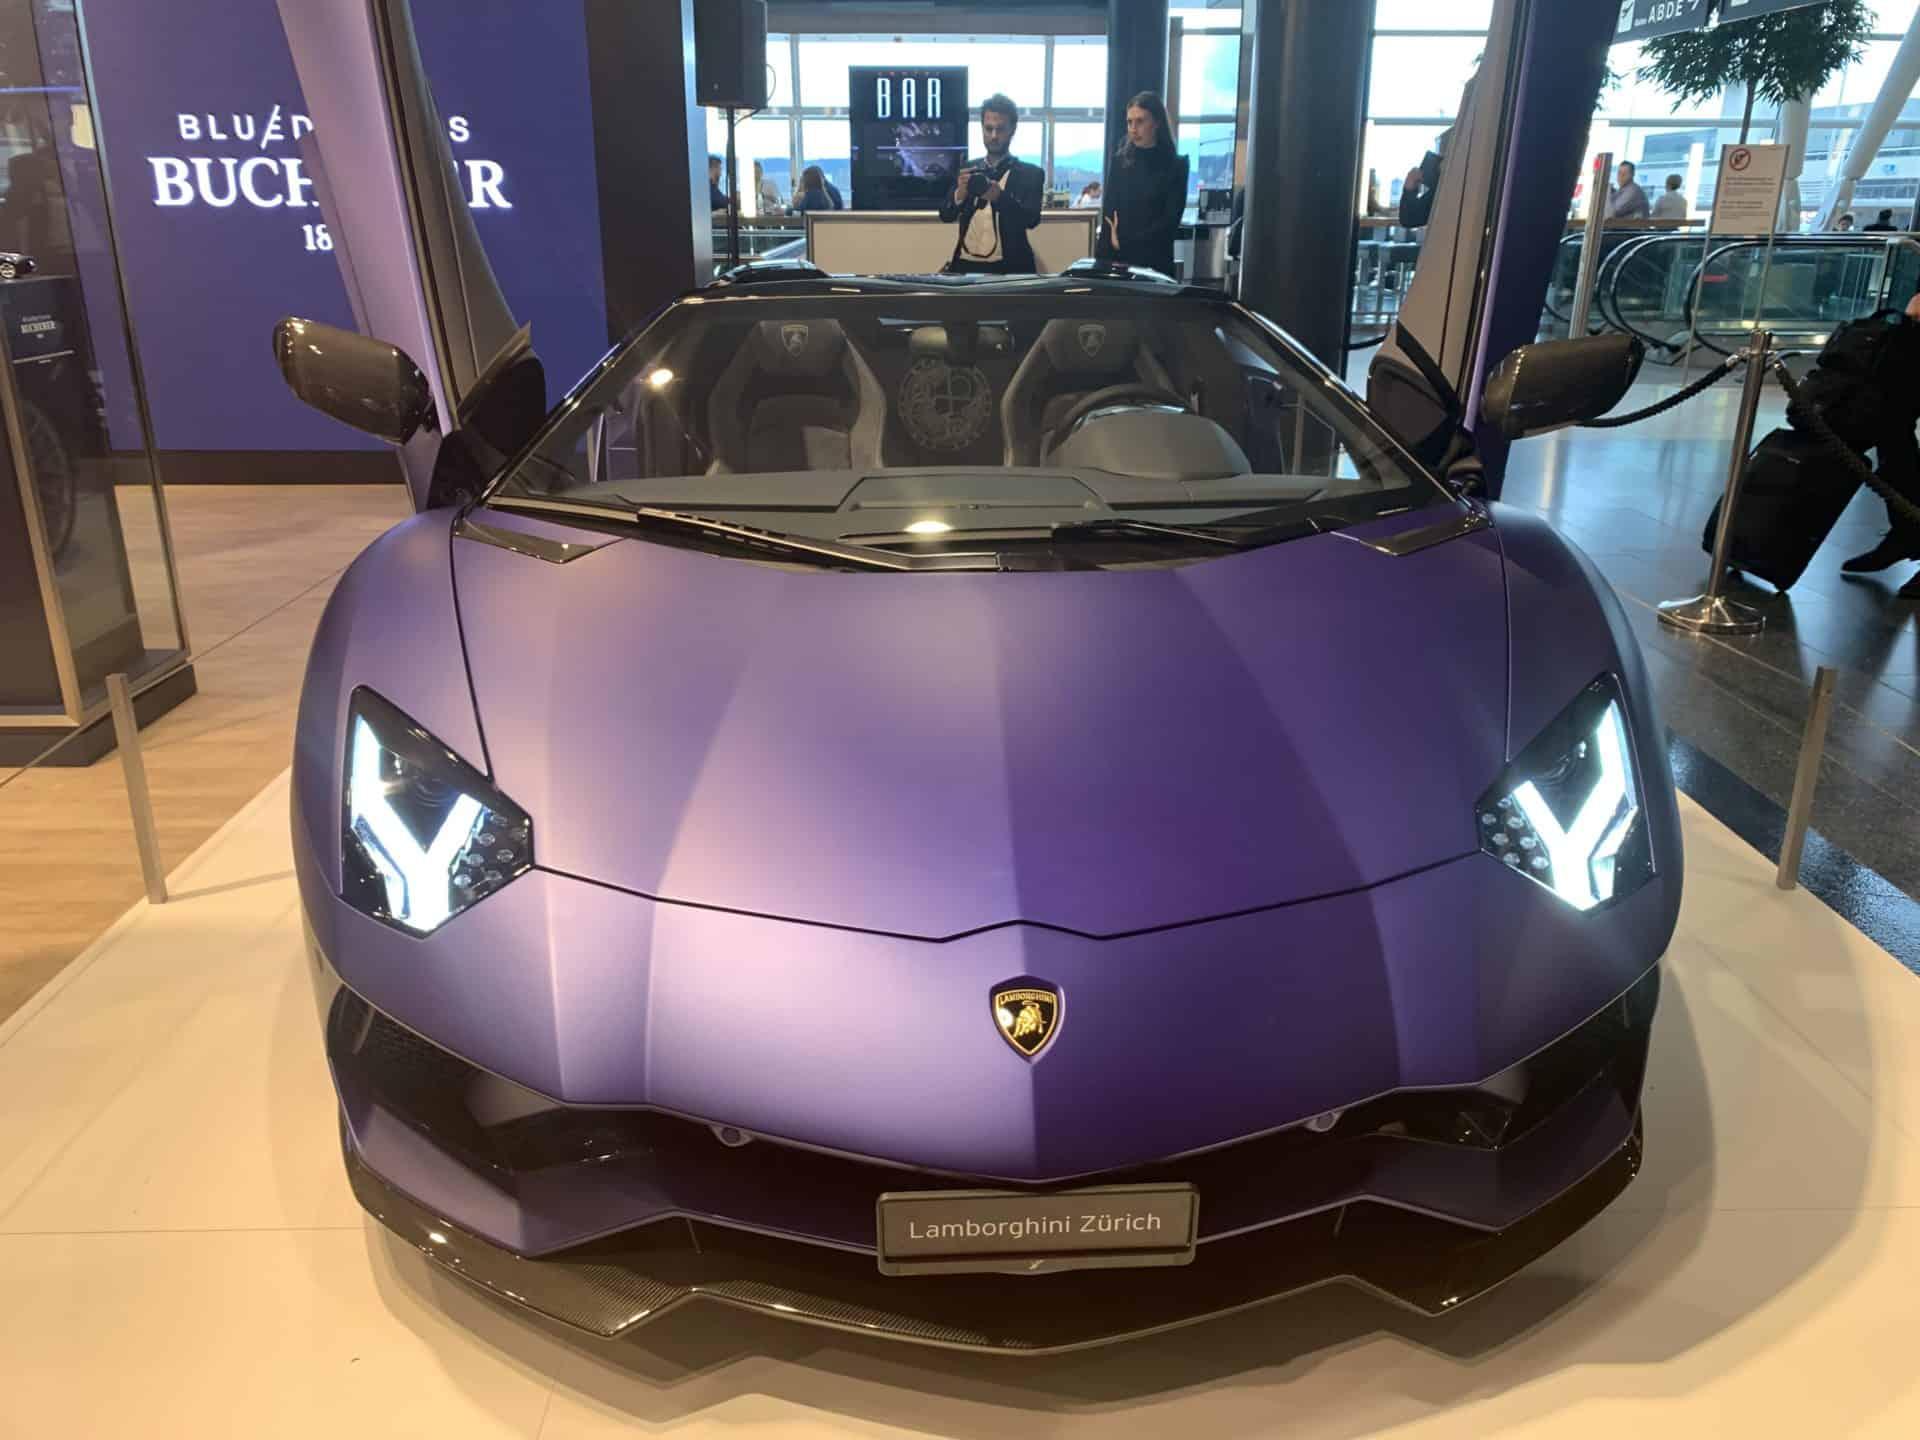 Lamborghini Aventador S Bucherer Blue Edition 1 Foto GLB